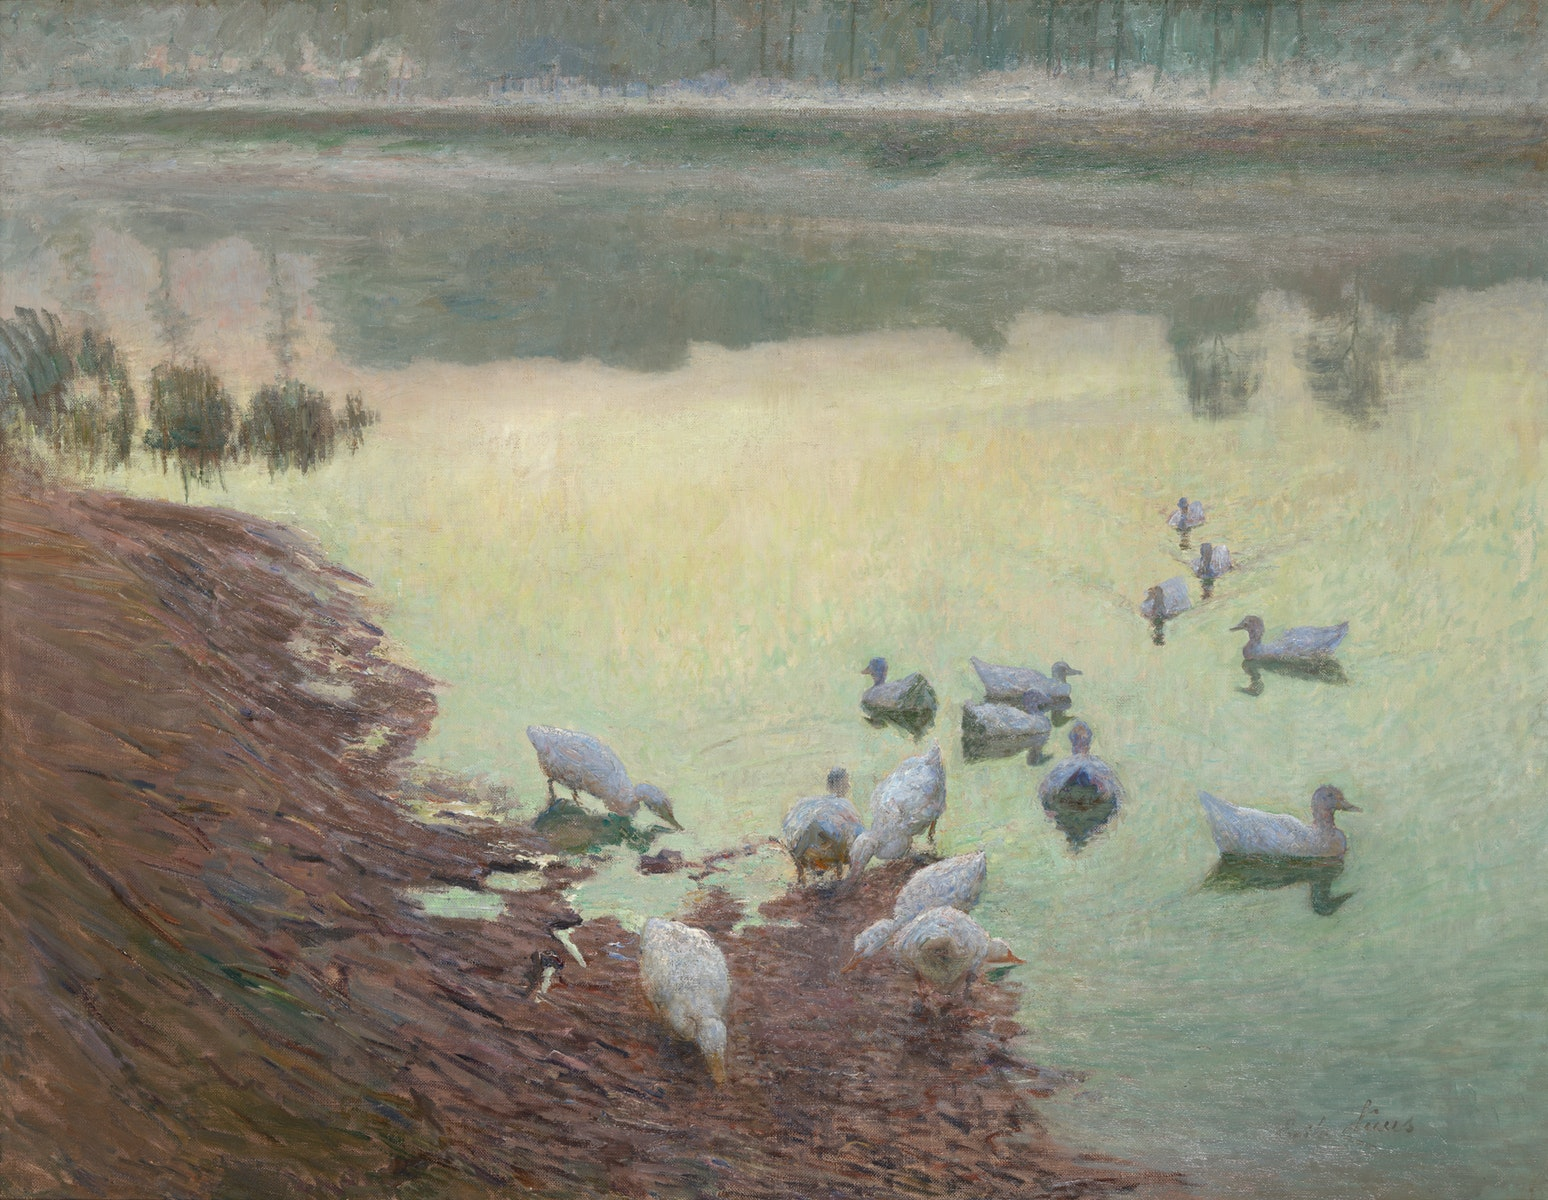 Emile Claus, Latemse School, Belgische Kunst, Leie, Lys, impressionisme